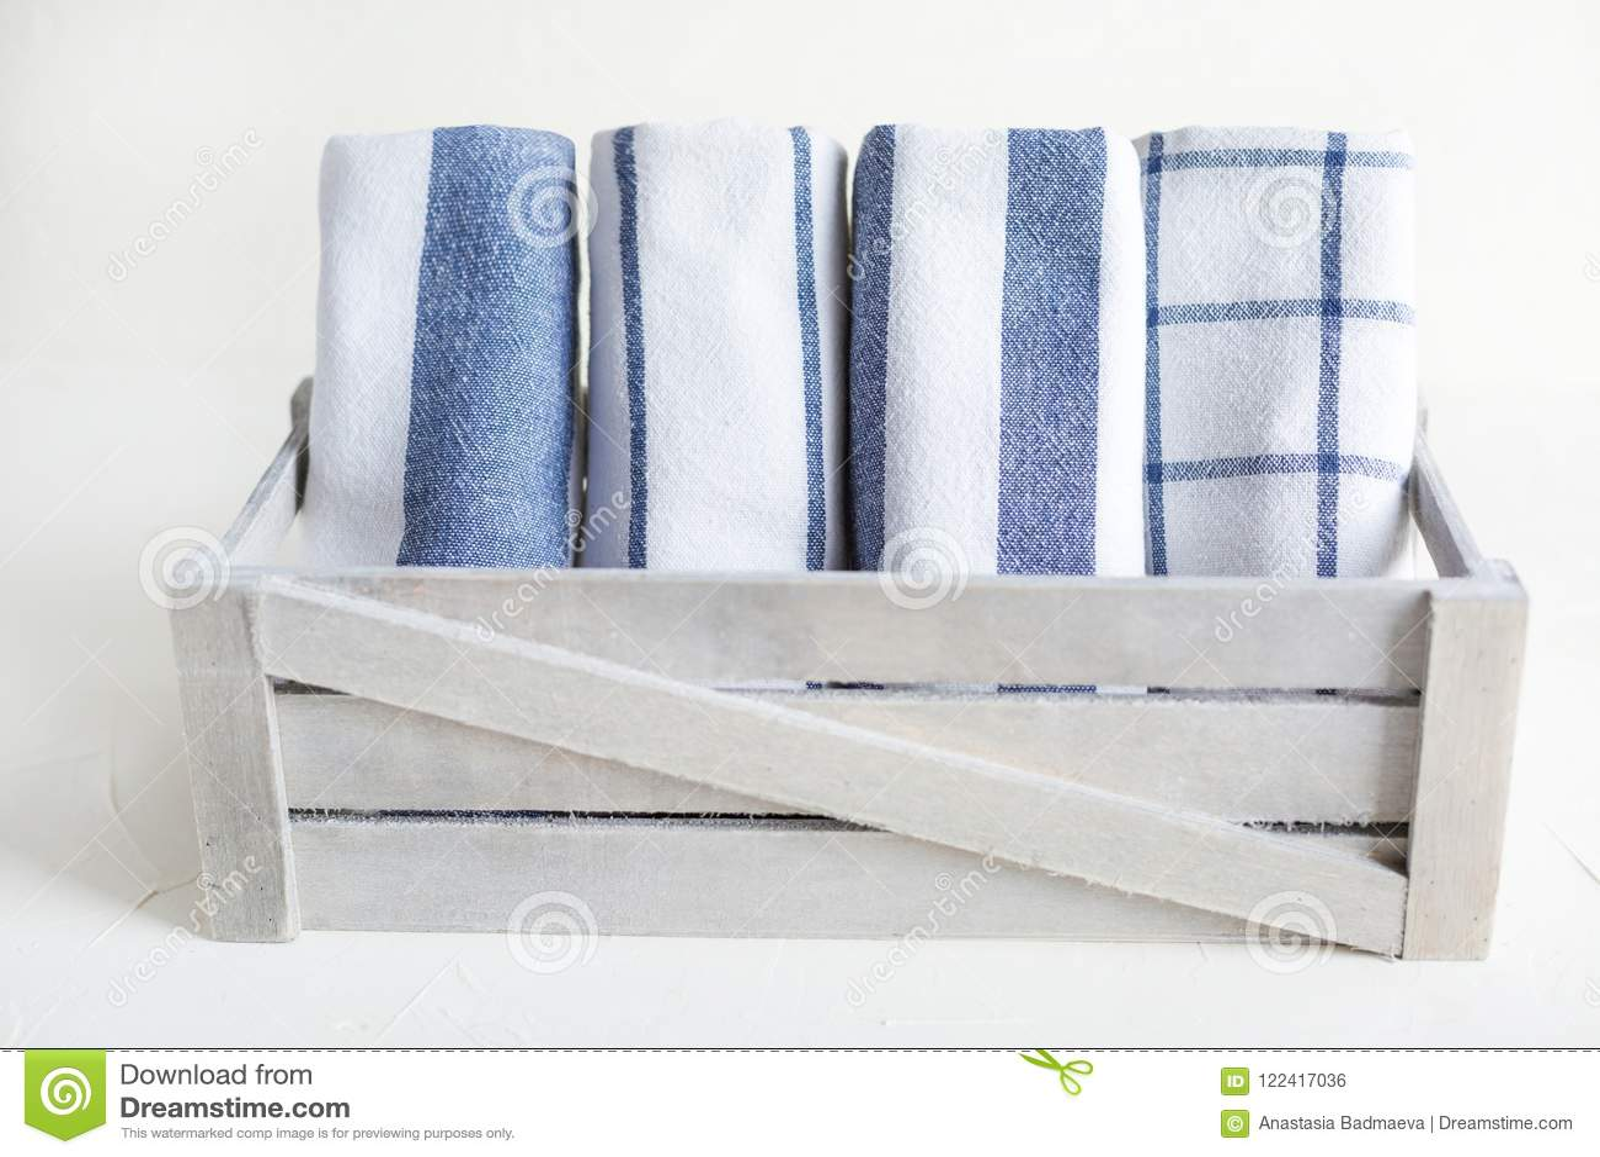 kitchen napkins vintage faucets cotton on the white concrete table scandynavian